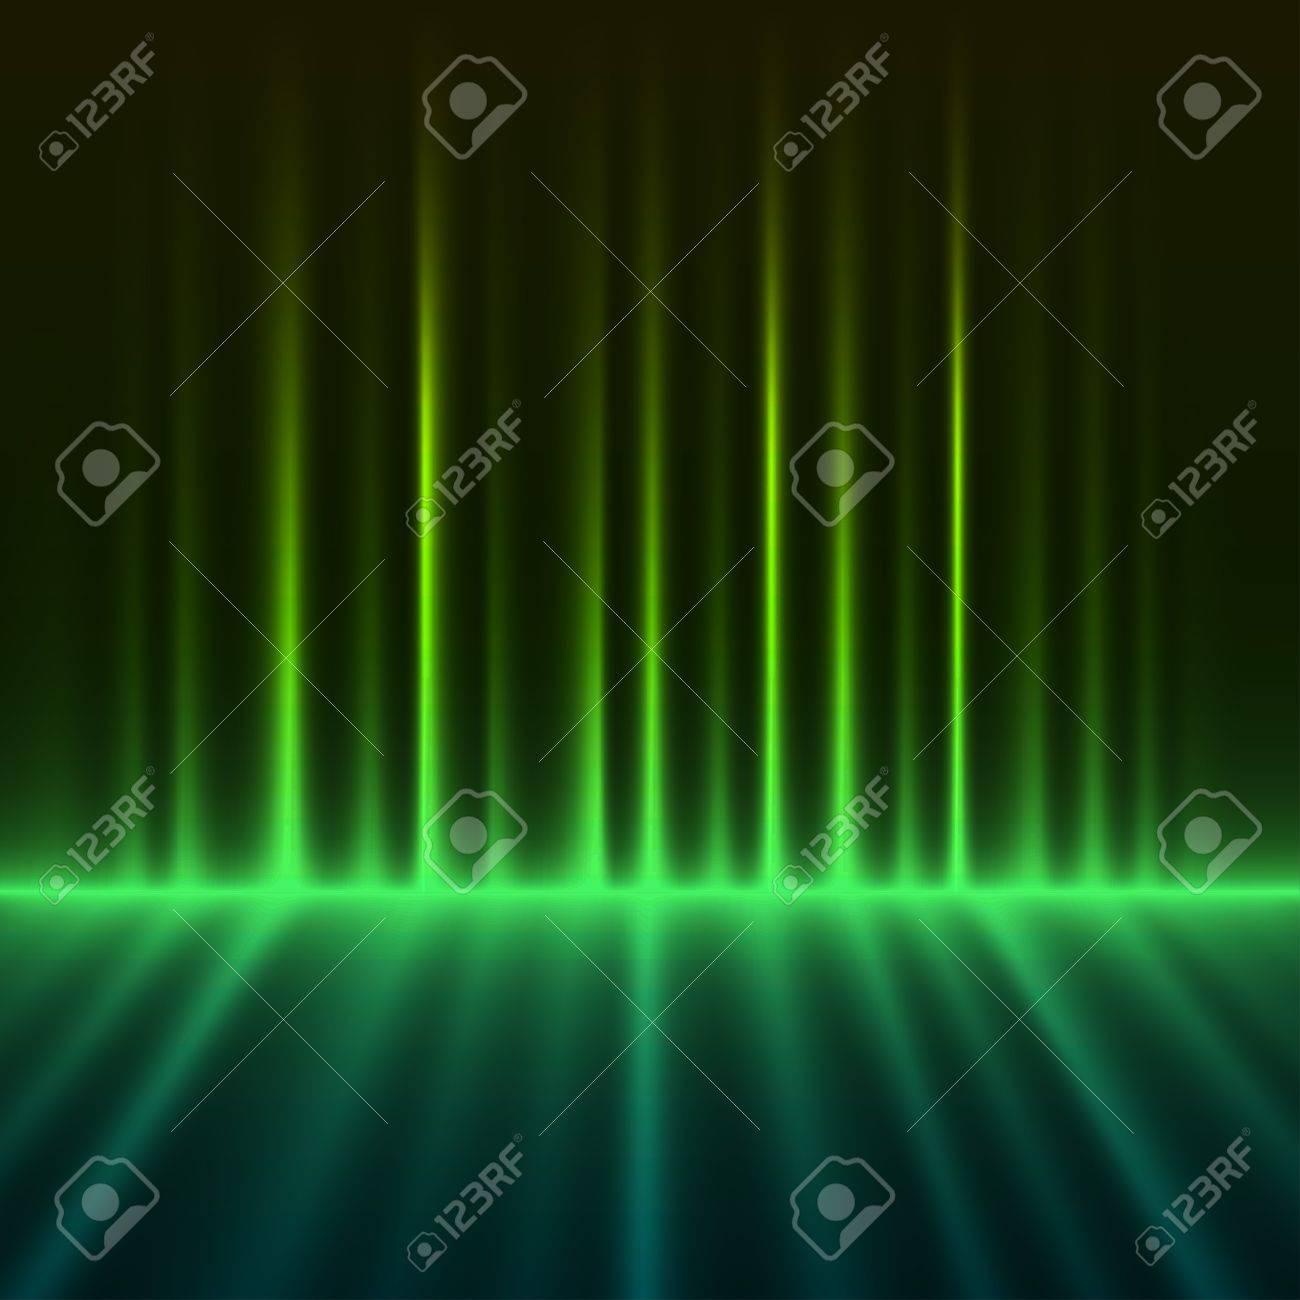 Abstract green colored aurora borealis lights vector background Stock Vector - 19701728